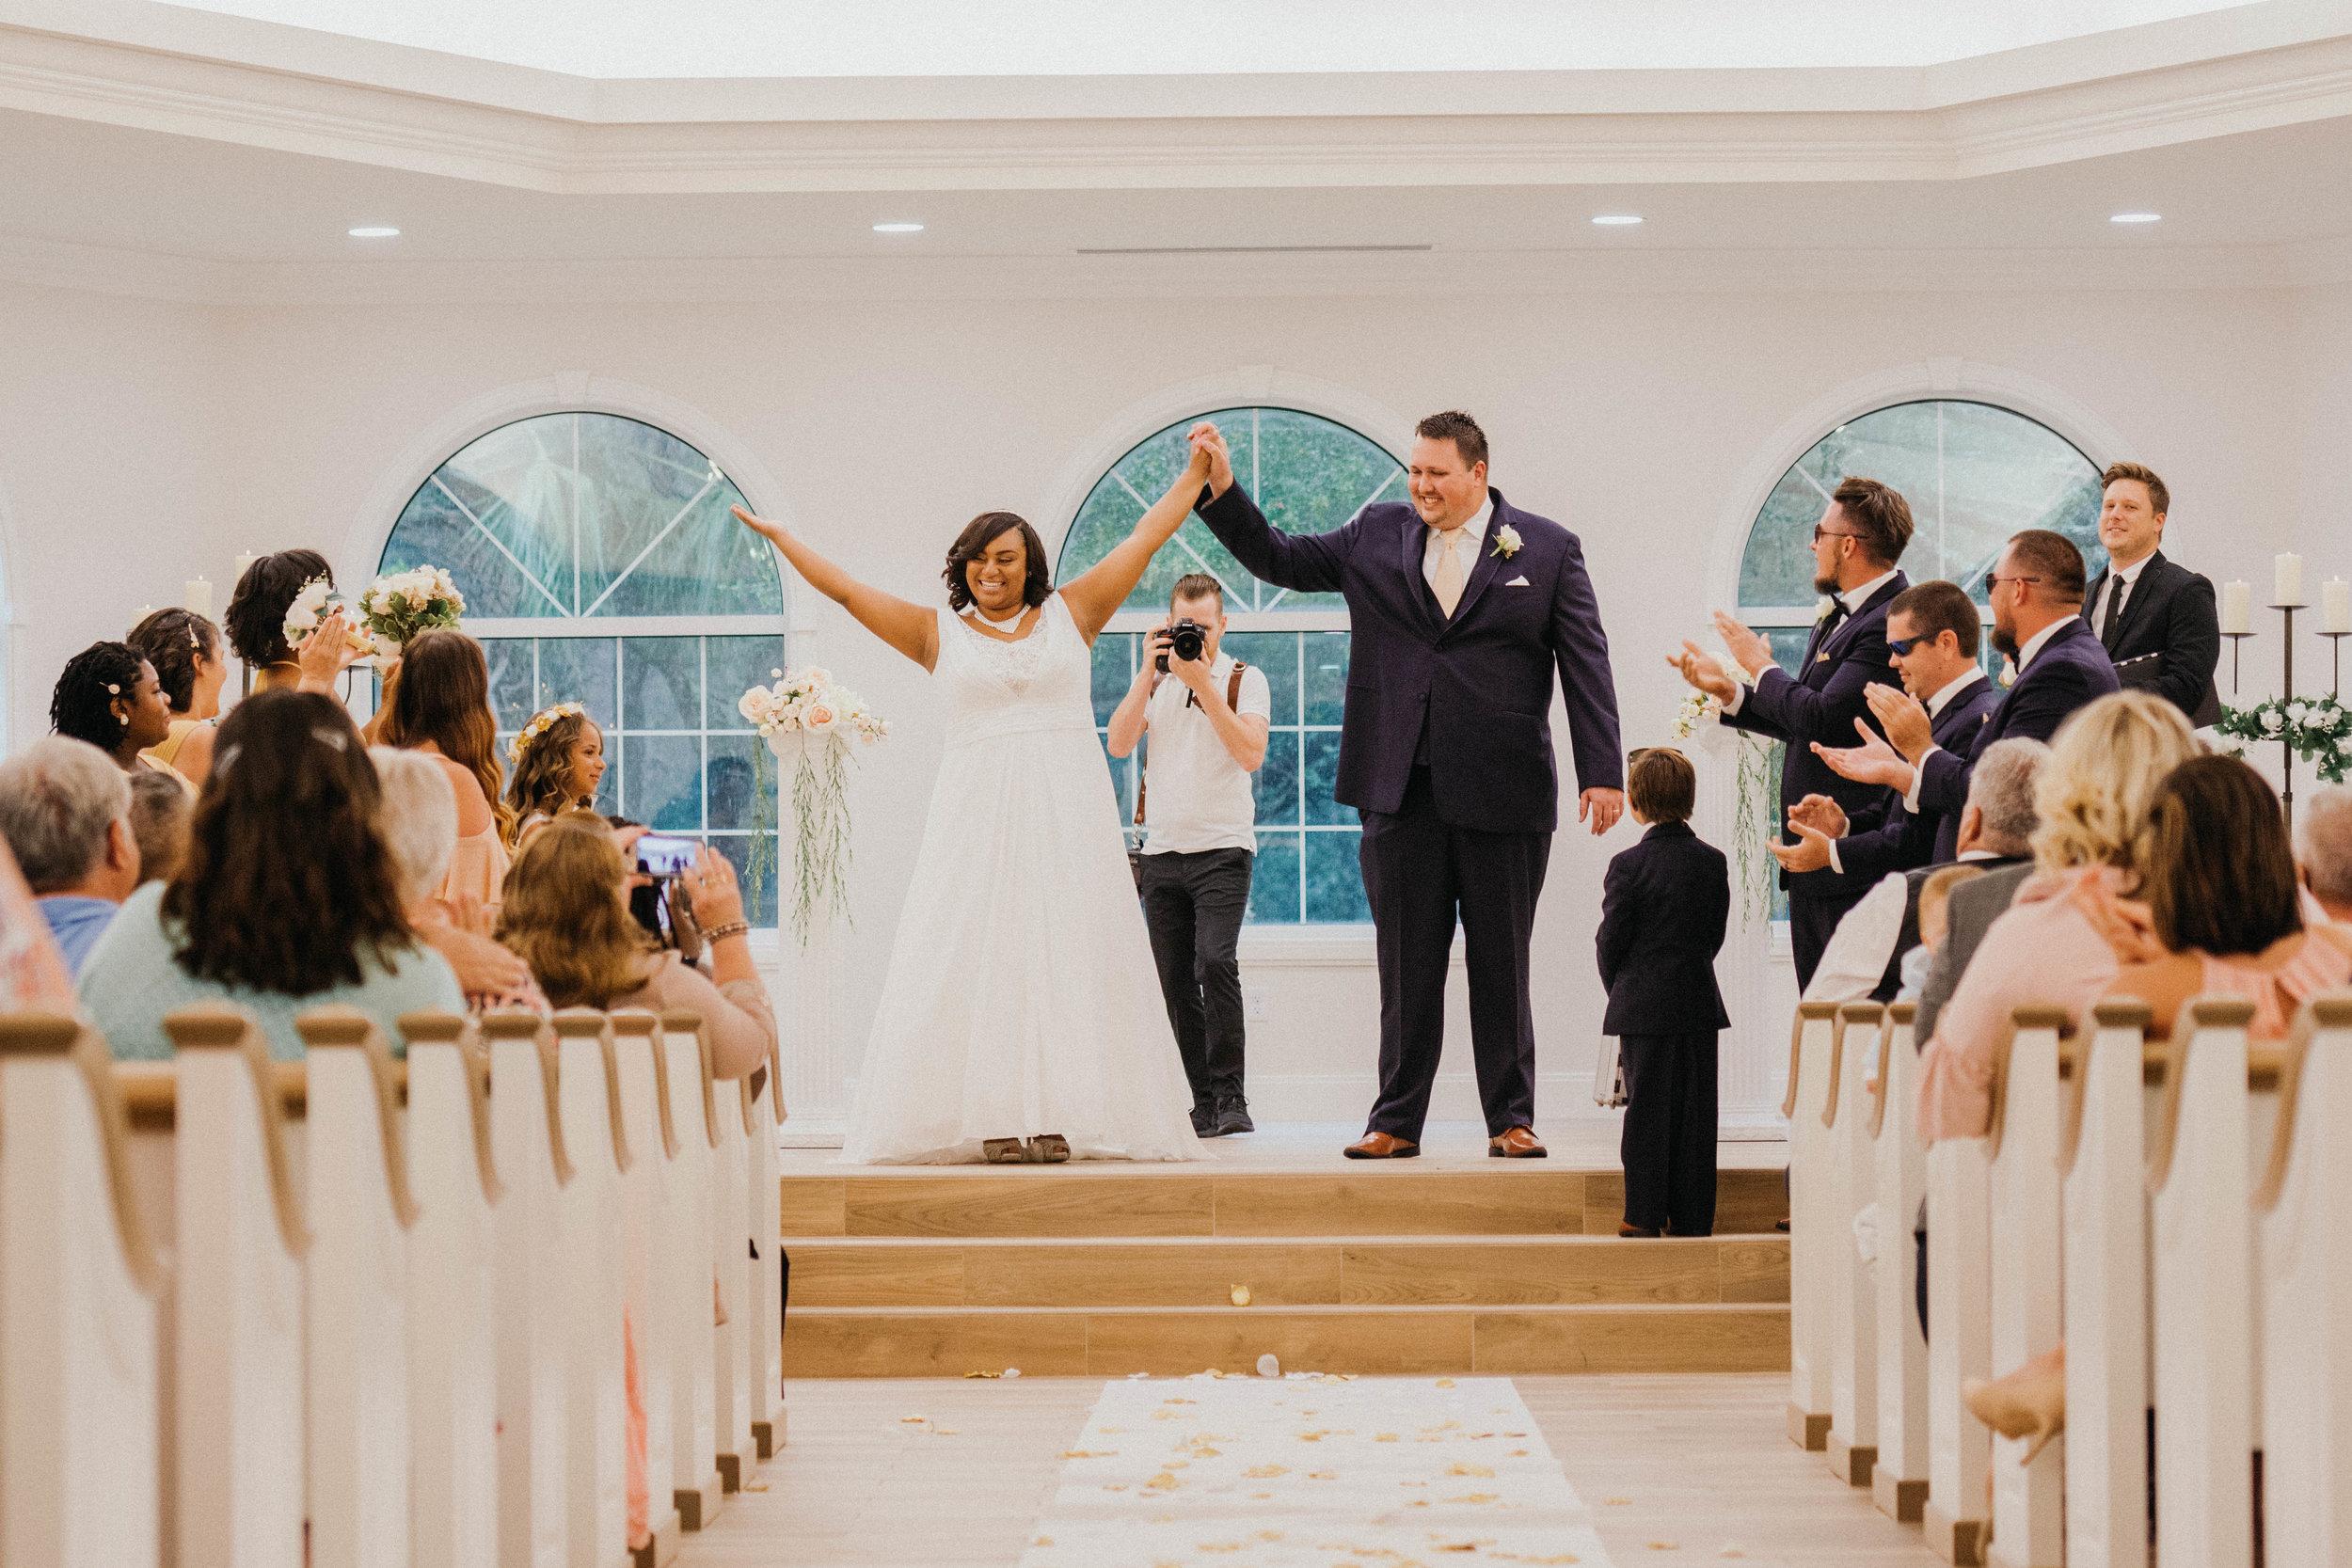 McNeile_Photography_Wedding_Tampa40.jpg